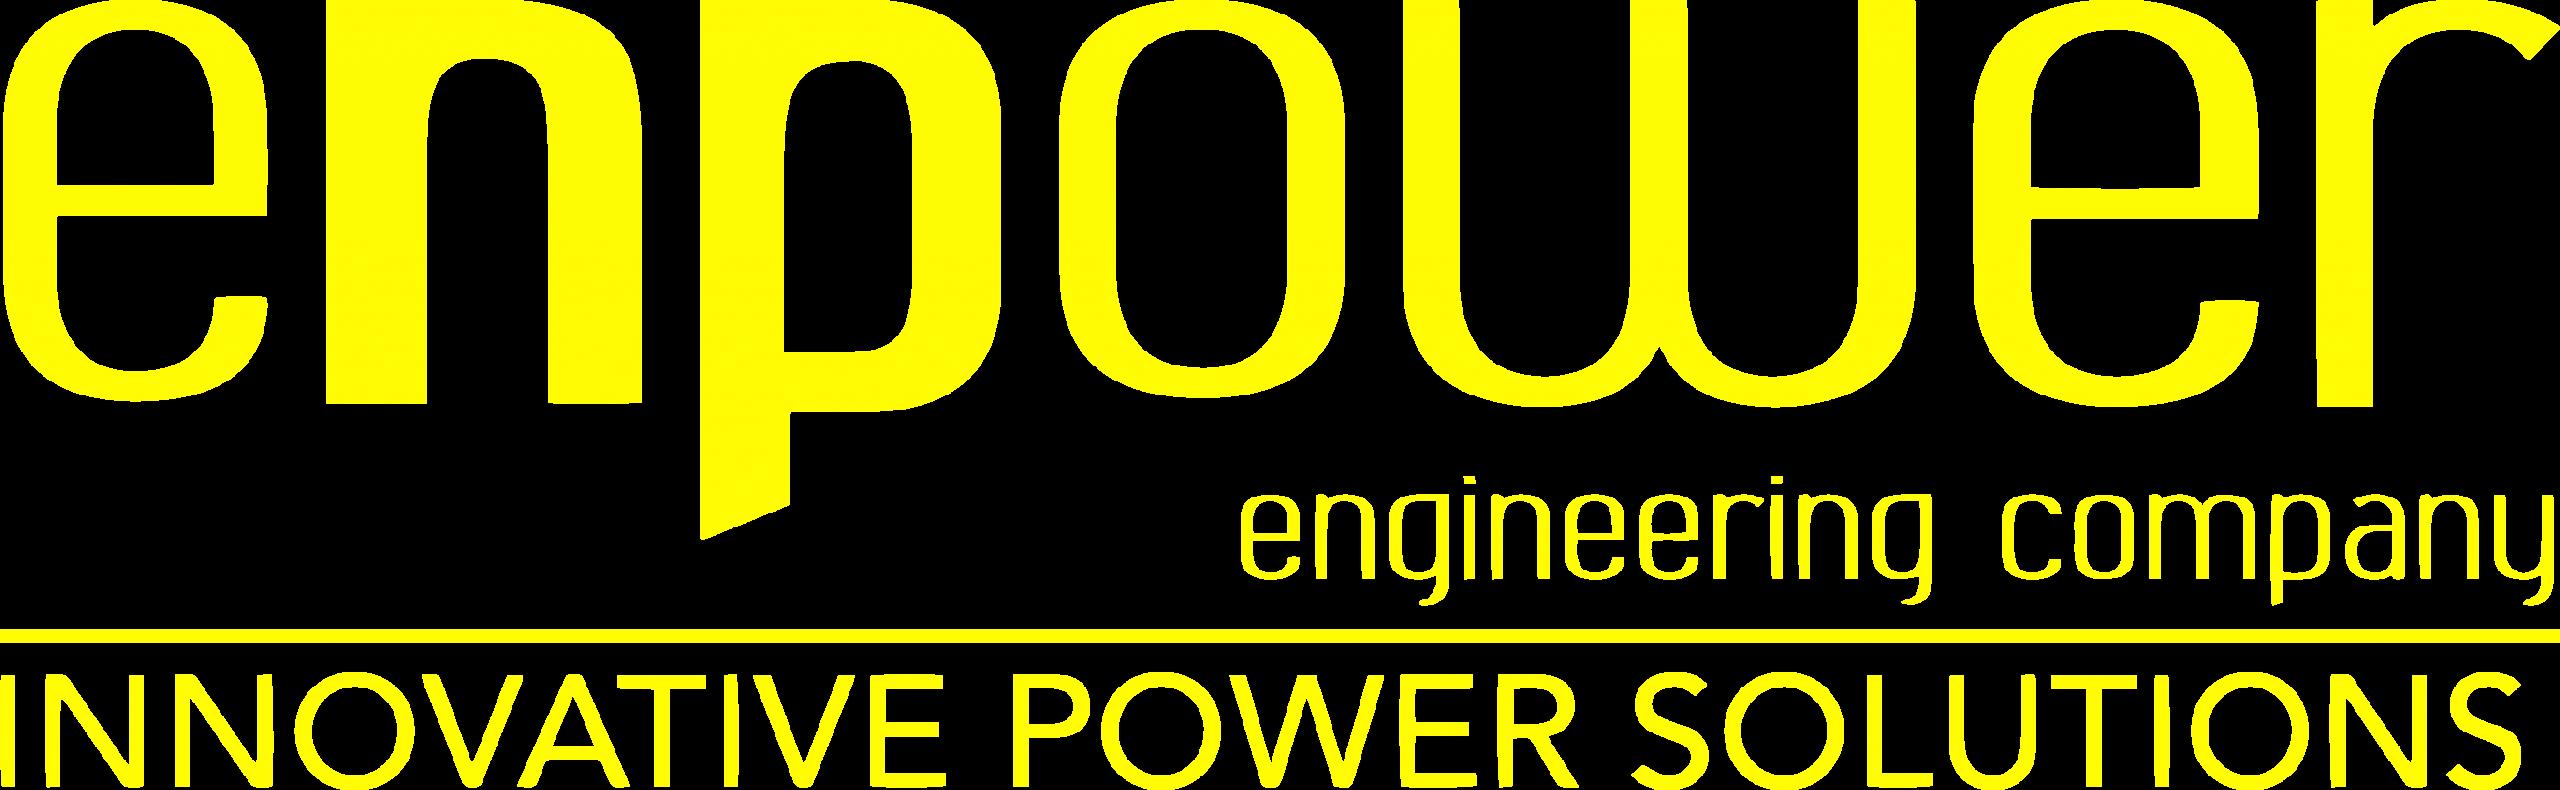 Enpower-Logo-png